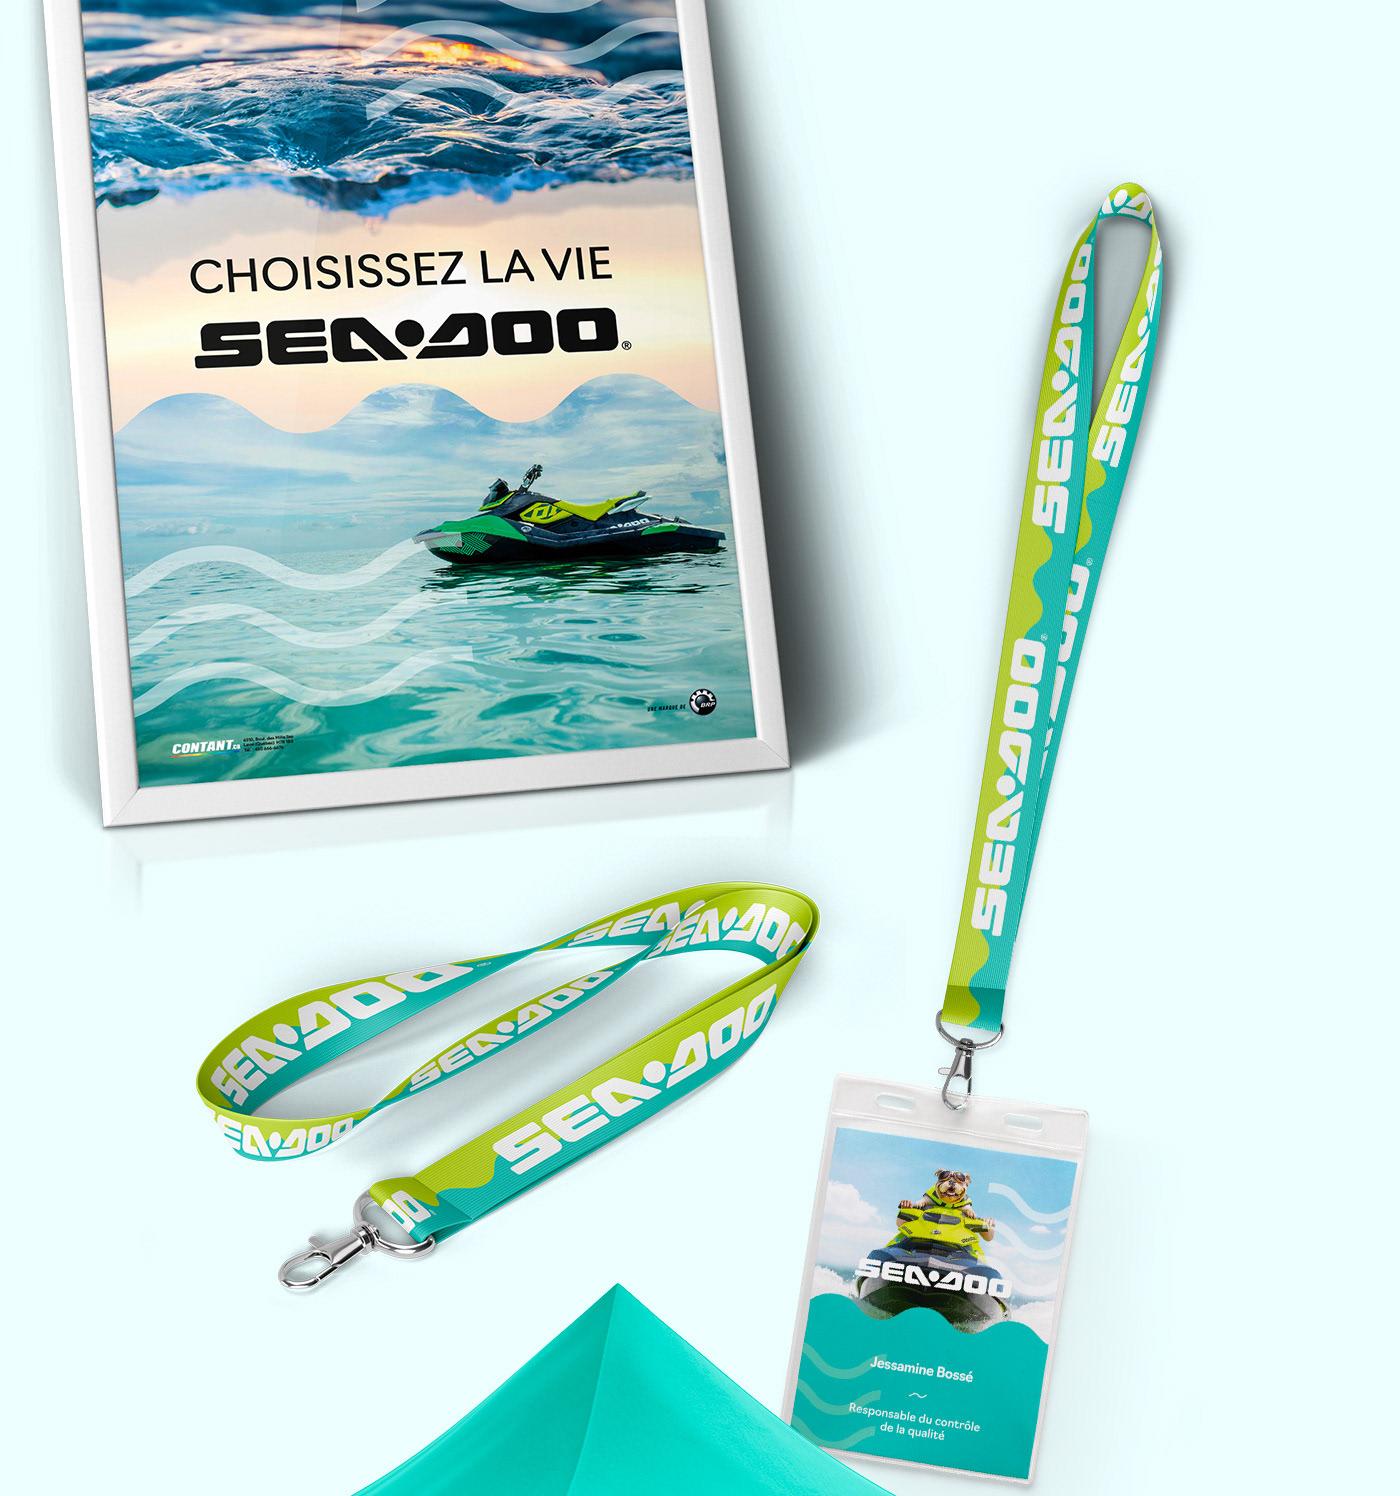 design Project Sea-doo